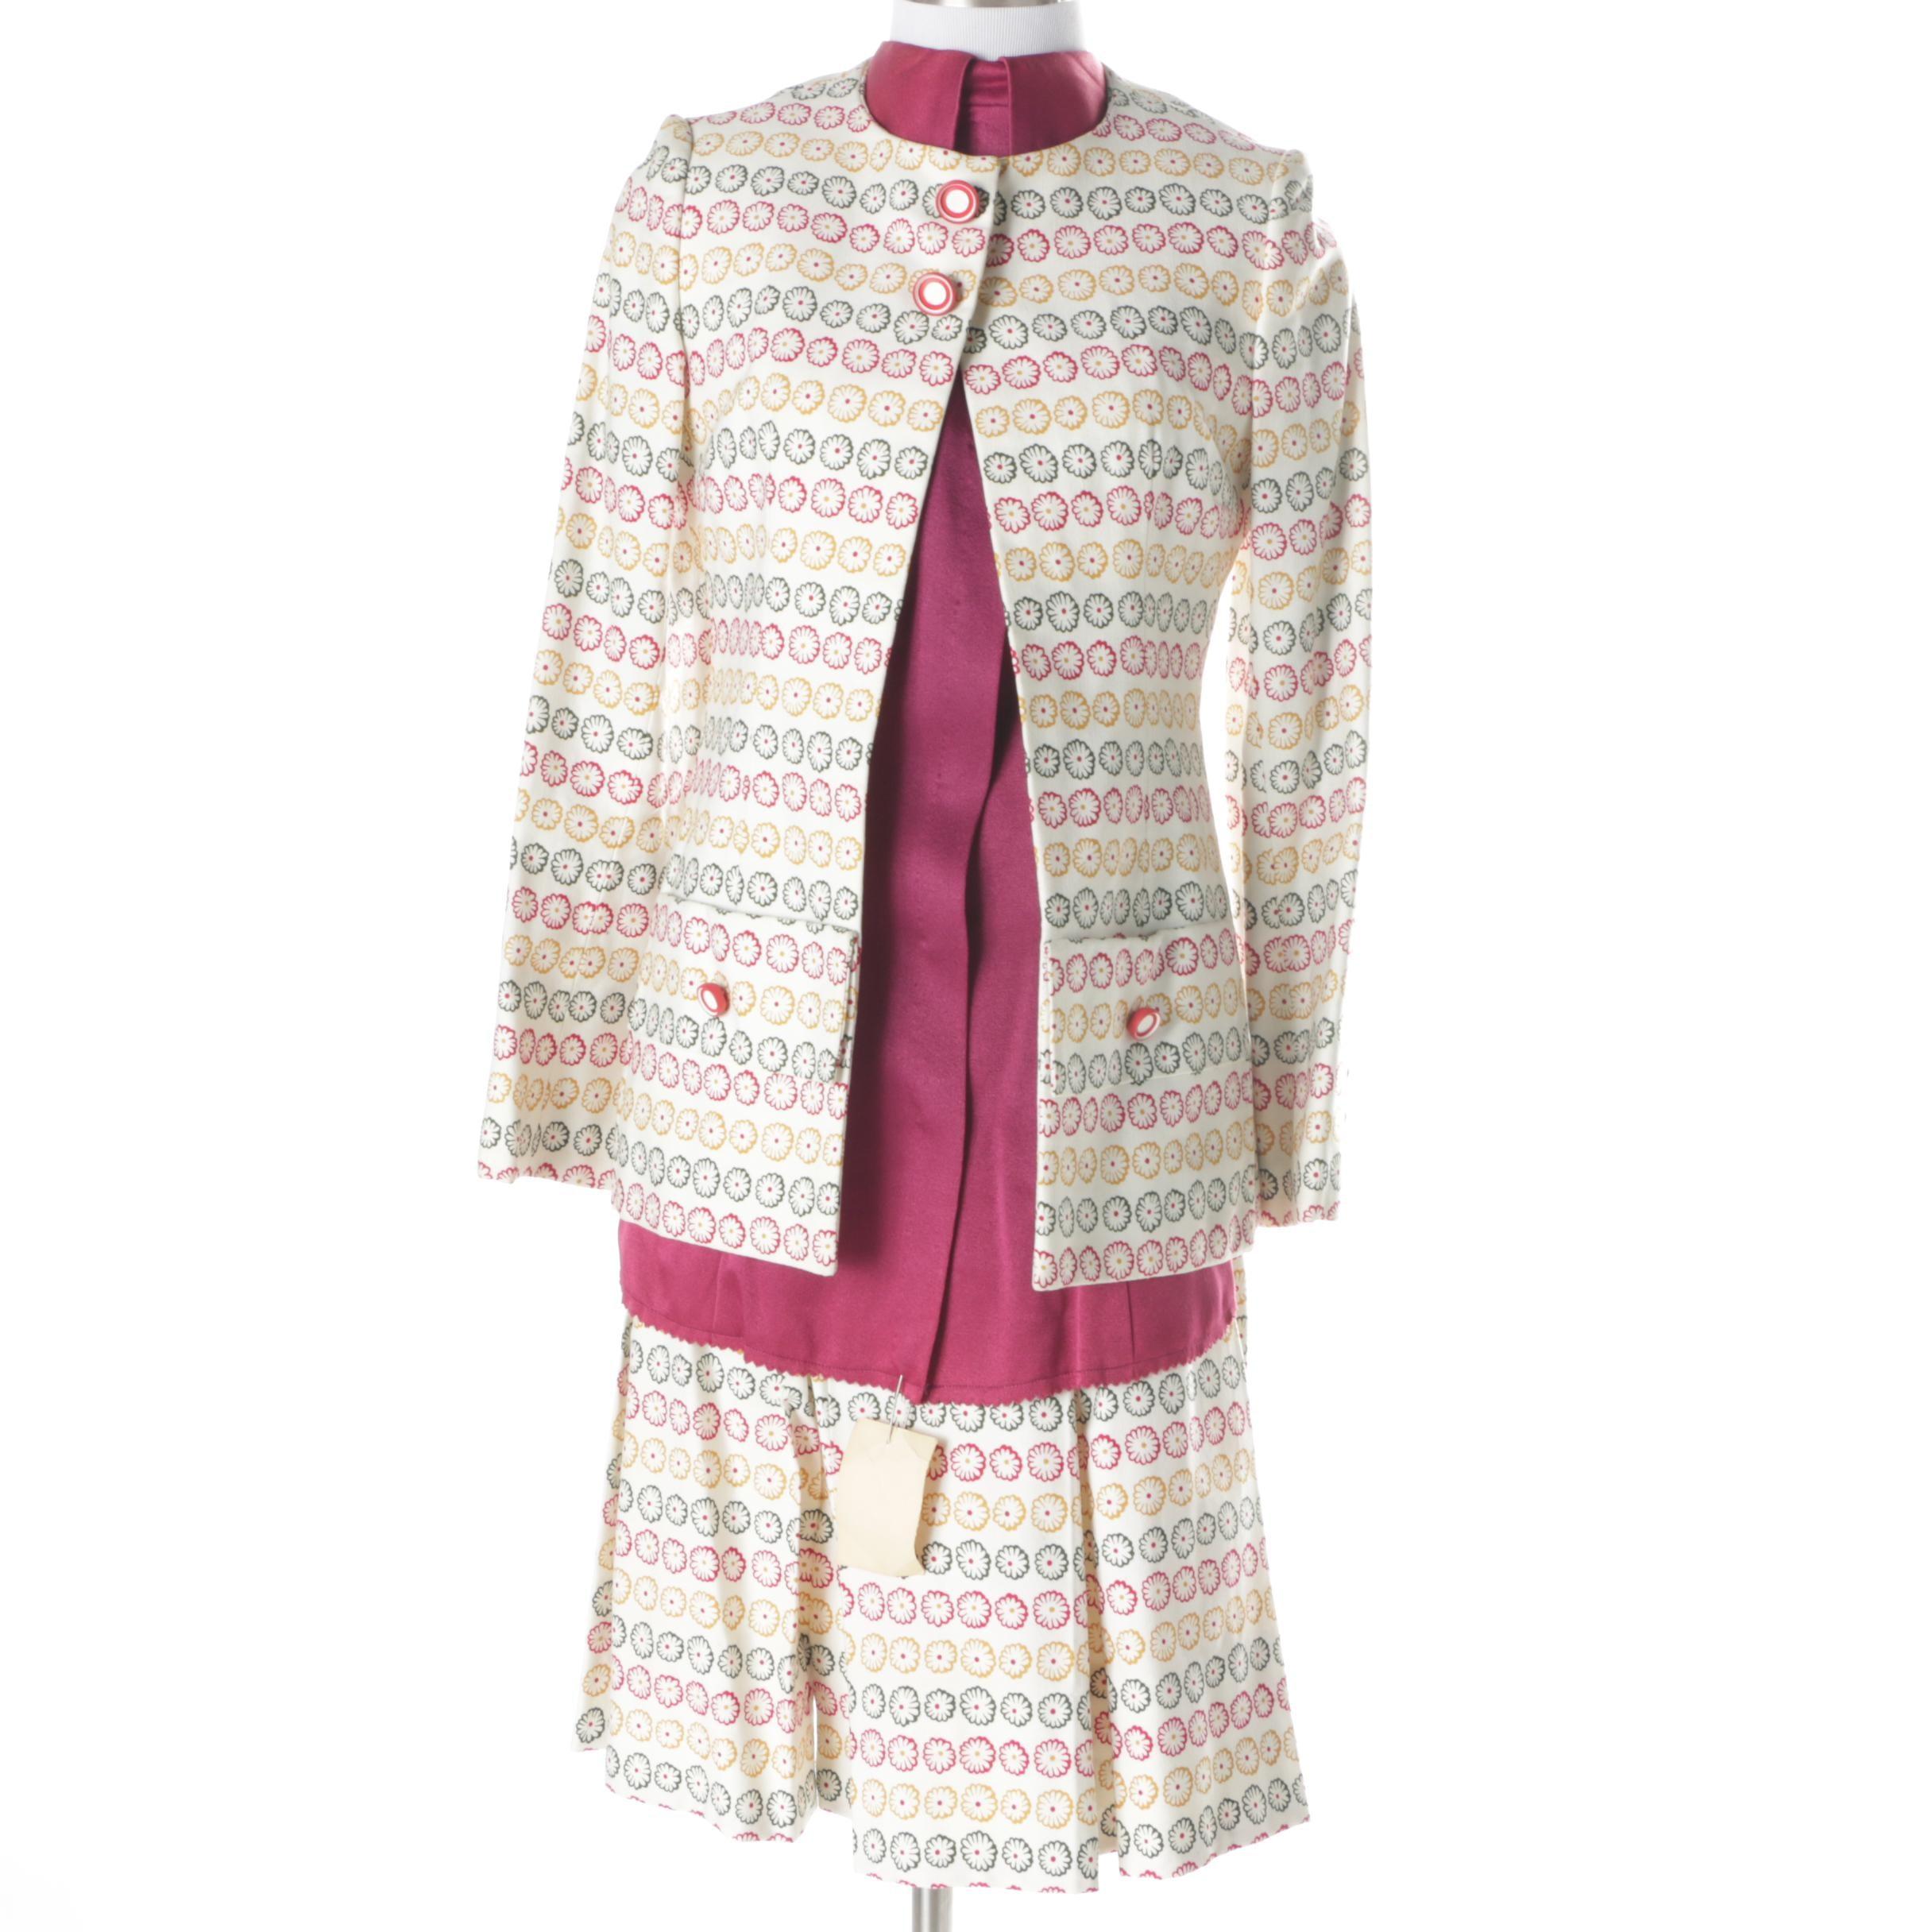 Vintage Cardinali Skirt Suit and Sample Shirt